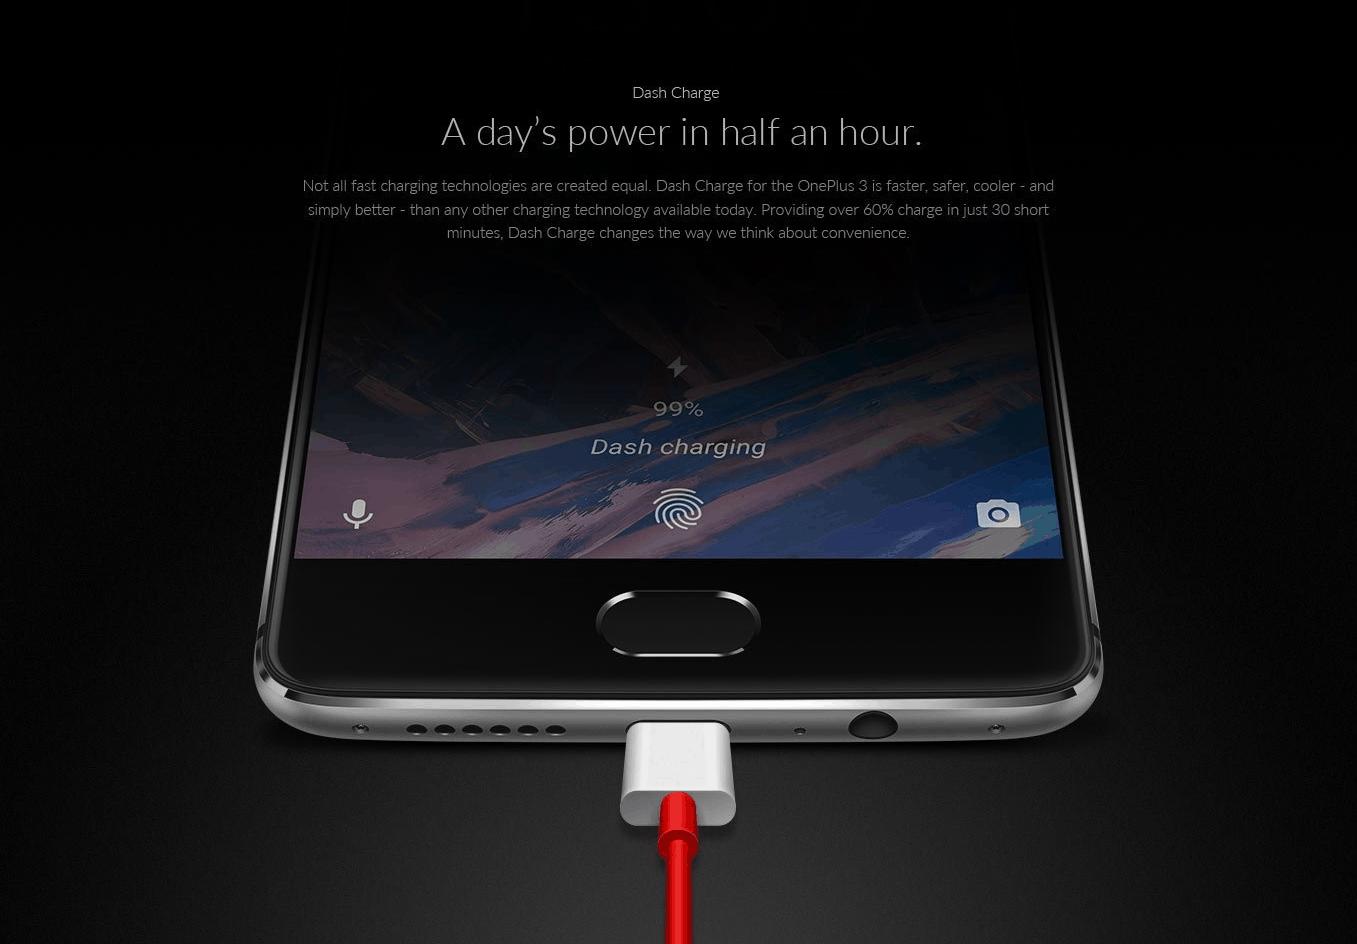 OnePlus 3 Amazon India Leak 2